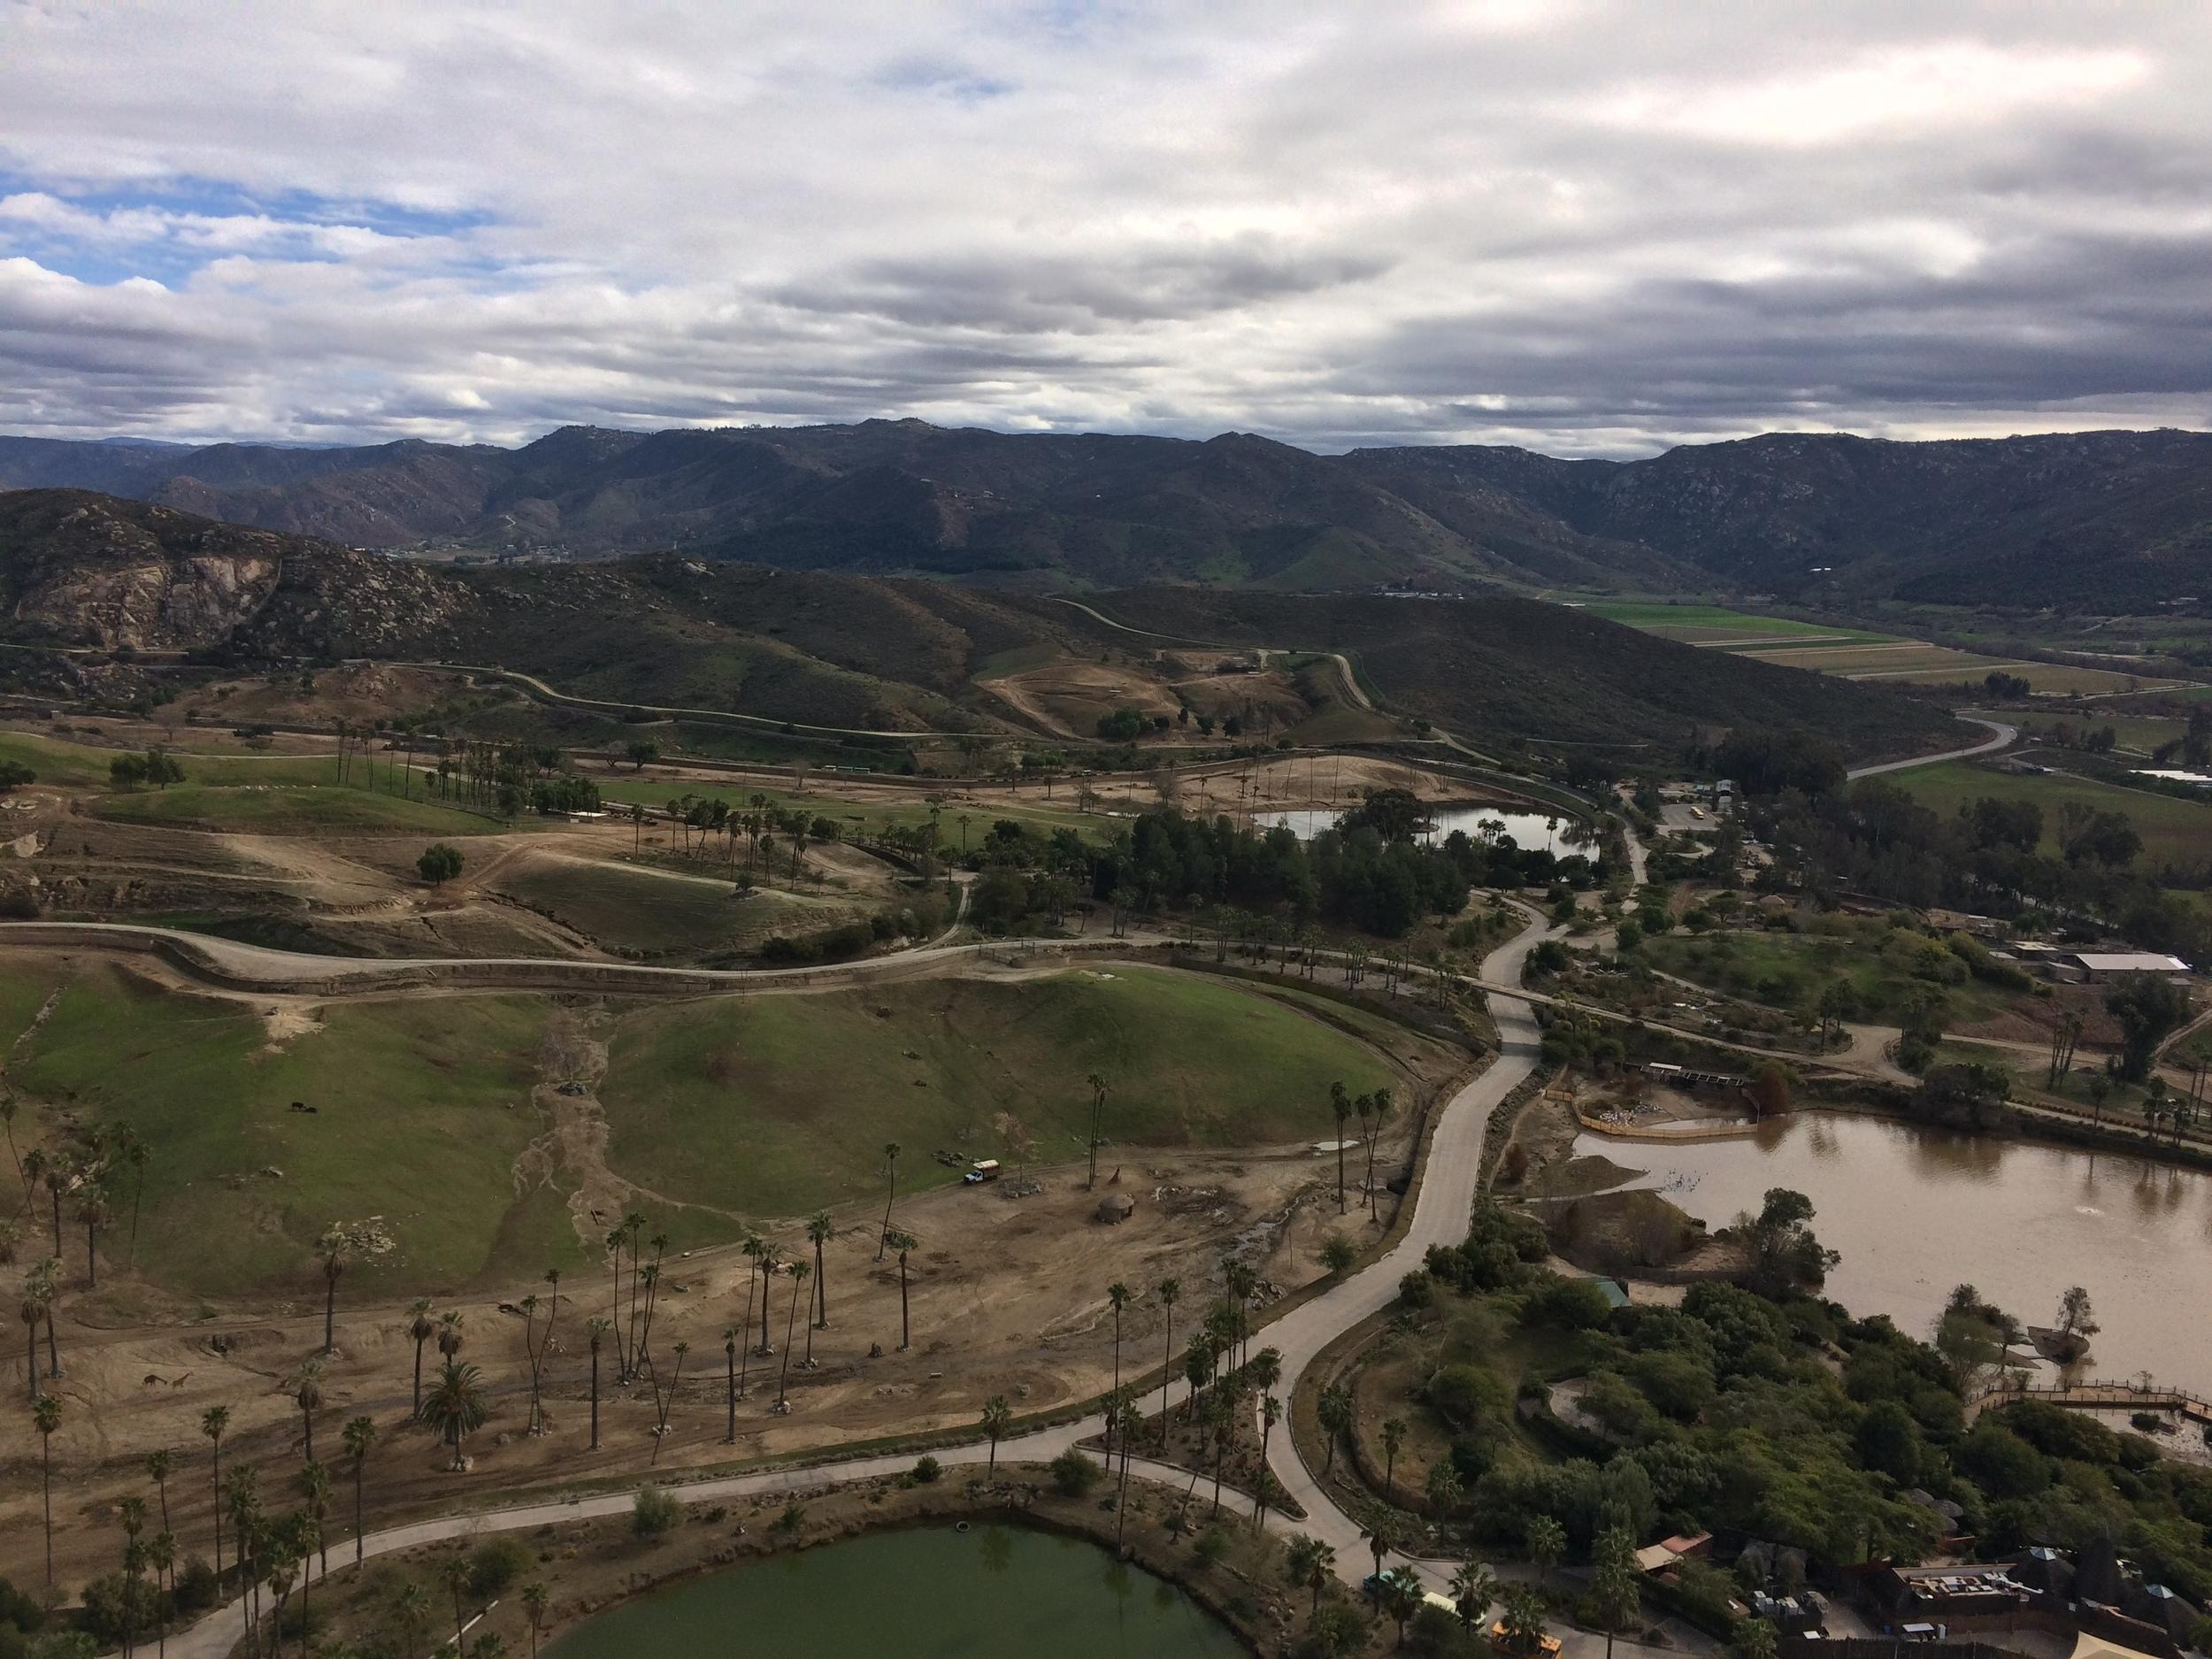 Looking down at the San Diego Safari Park from the Safari Balloon